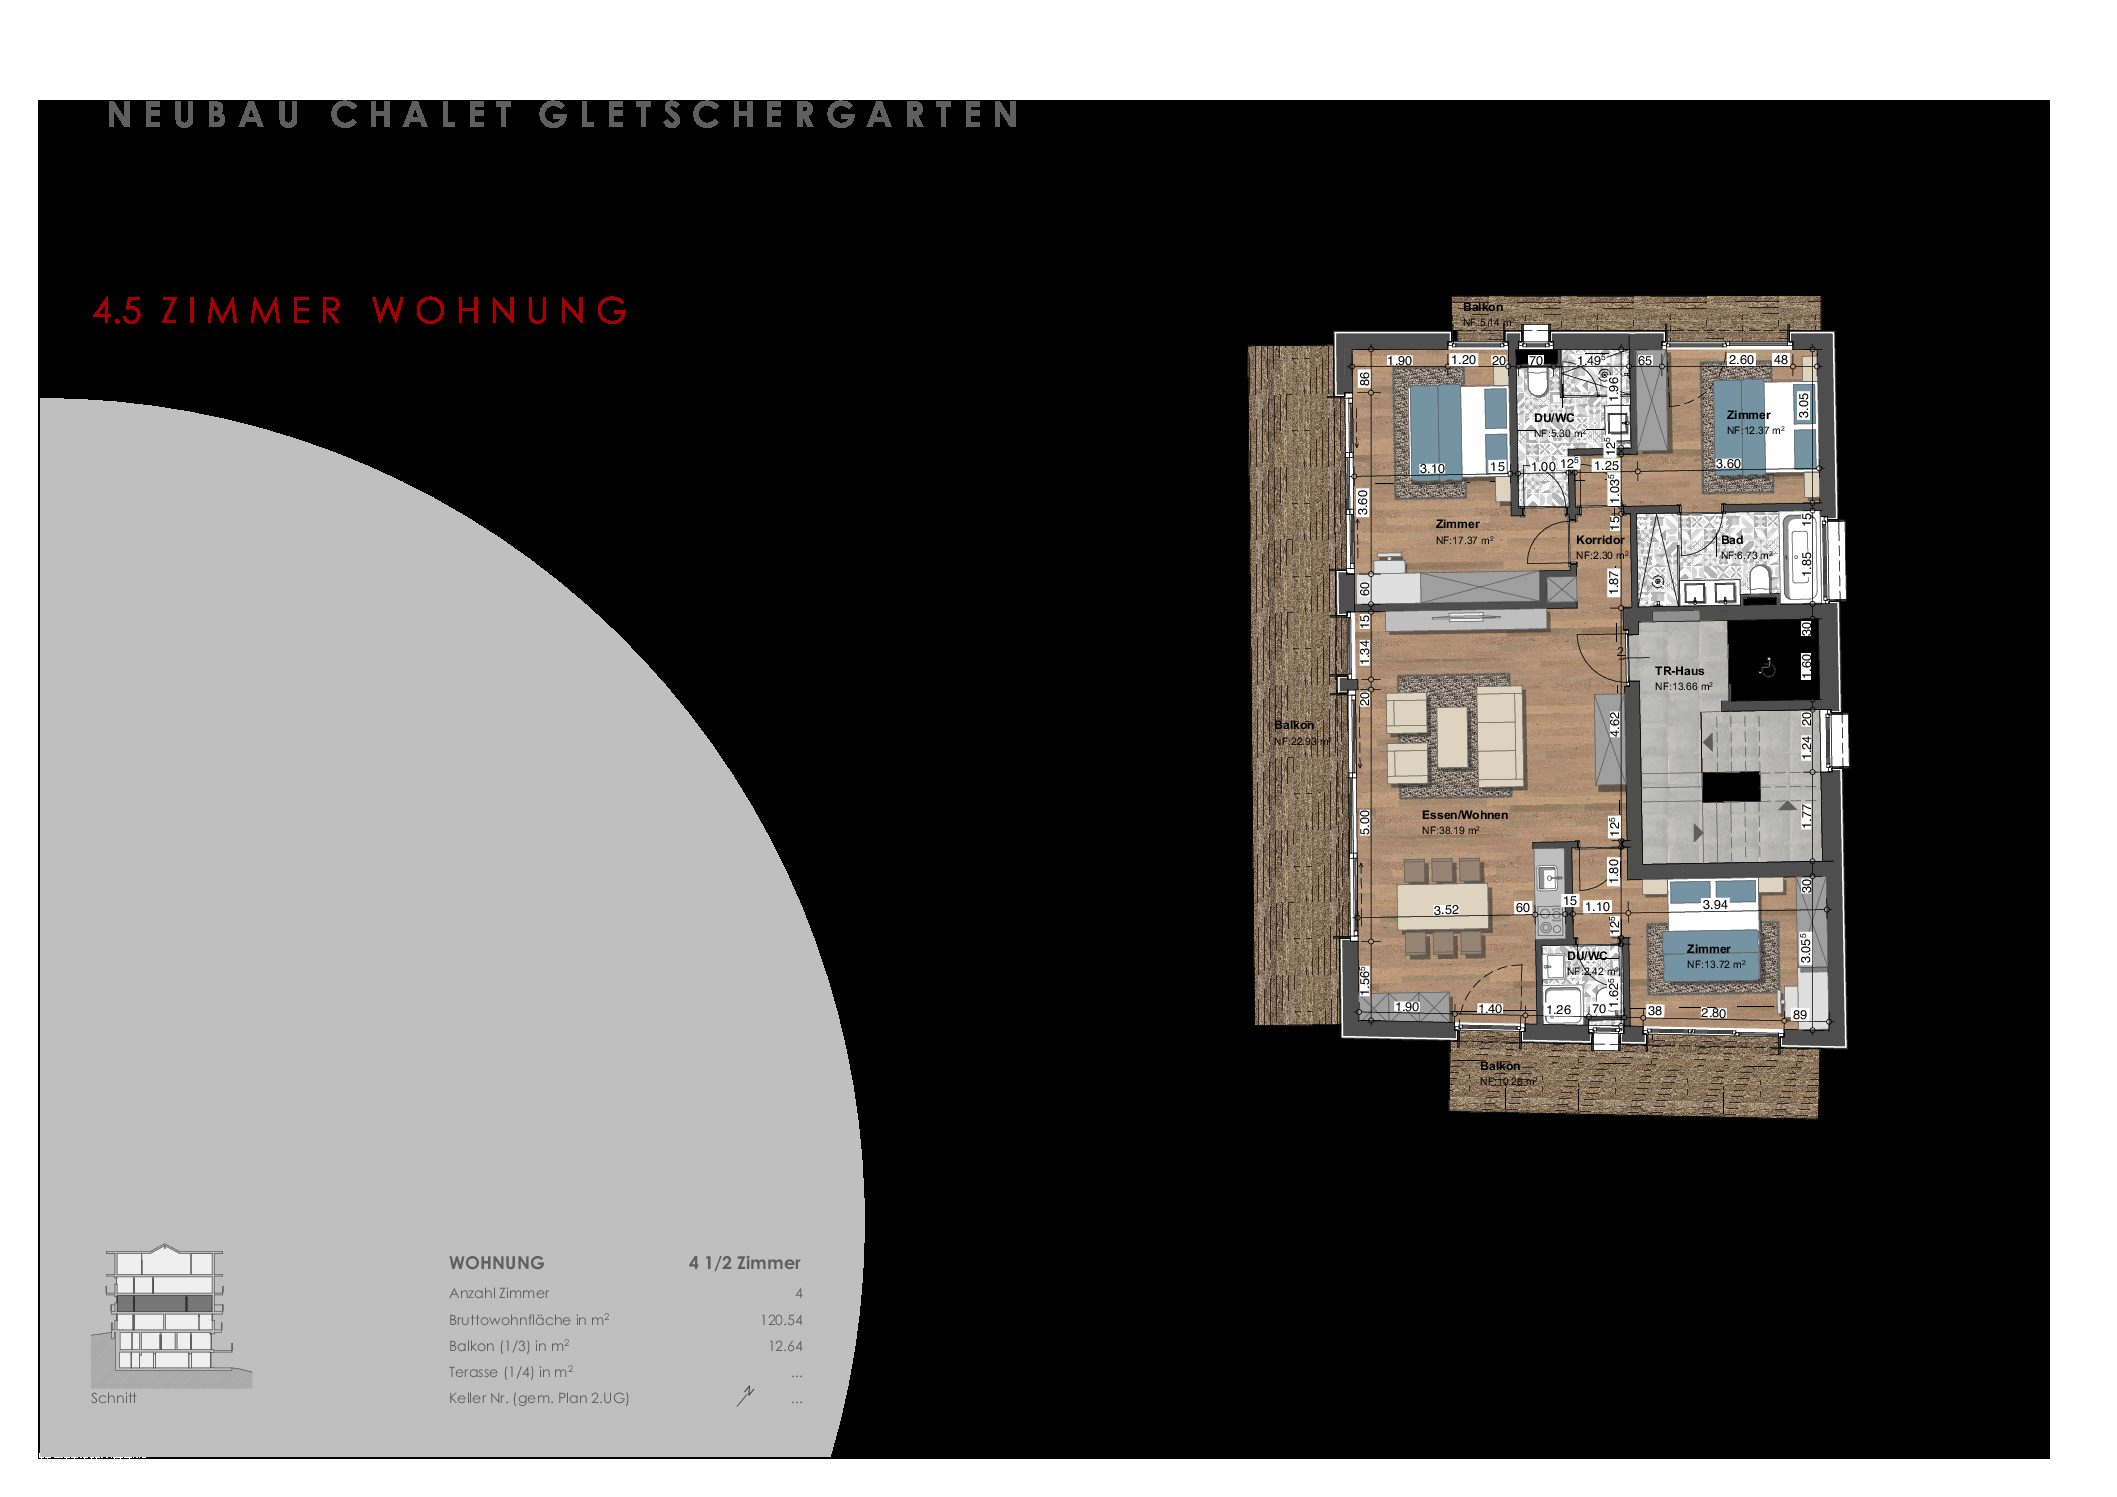 Brand new apartment in central dream location